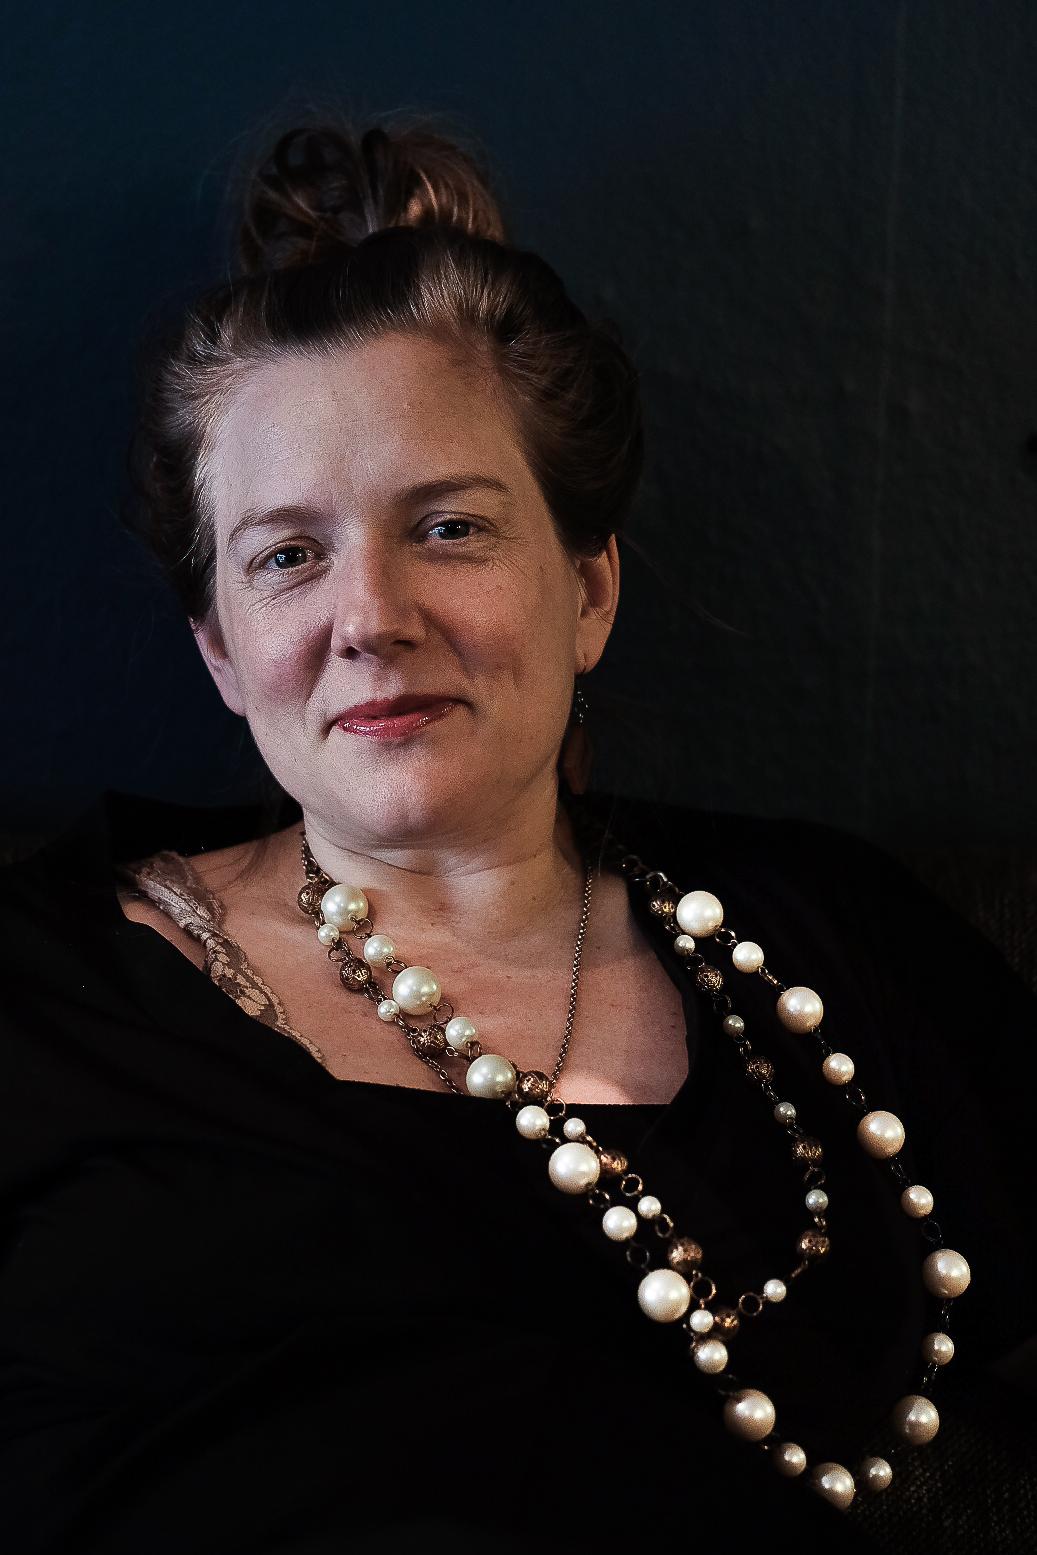 Tove Folkesson, author